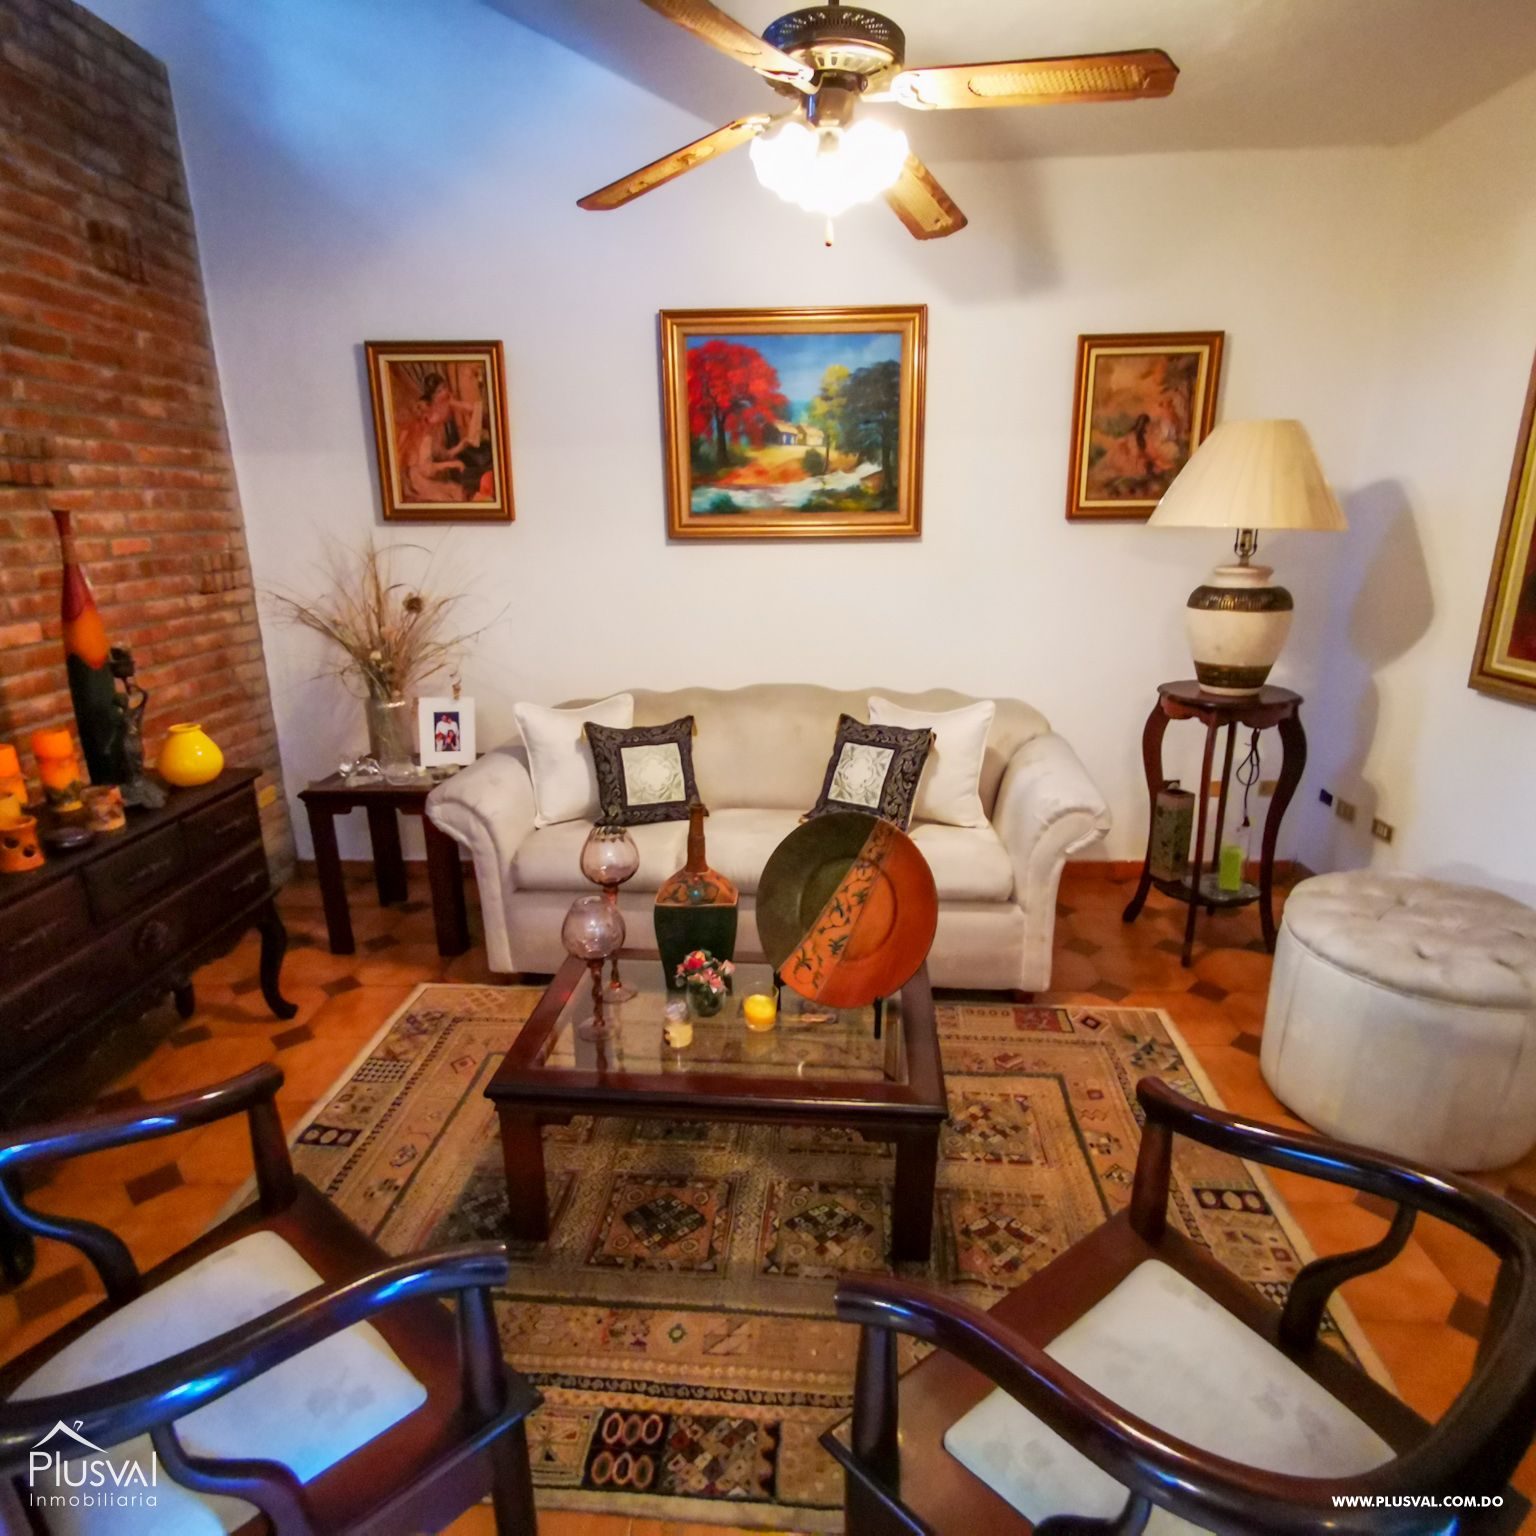 Casa-Terreno 500 mts2 Ideal para Plaza o Local Comercial en Los Prados 179160